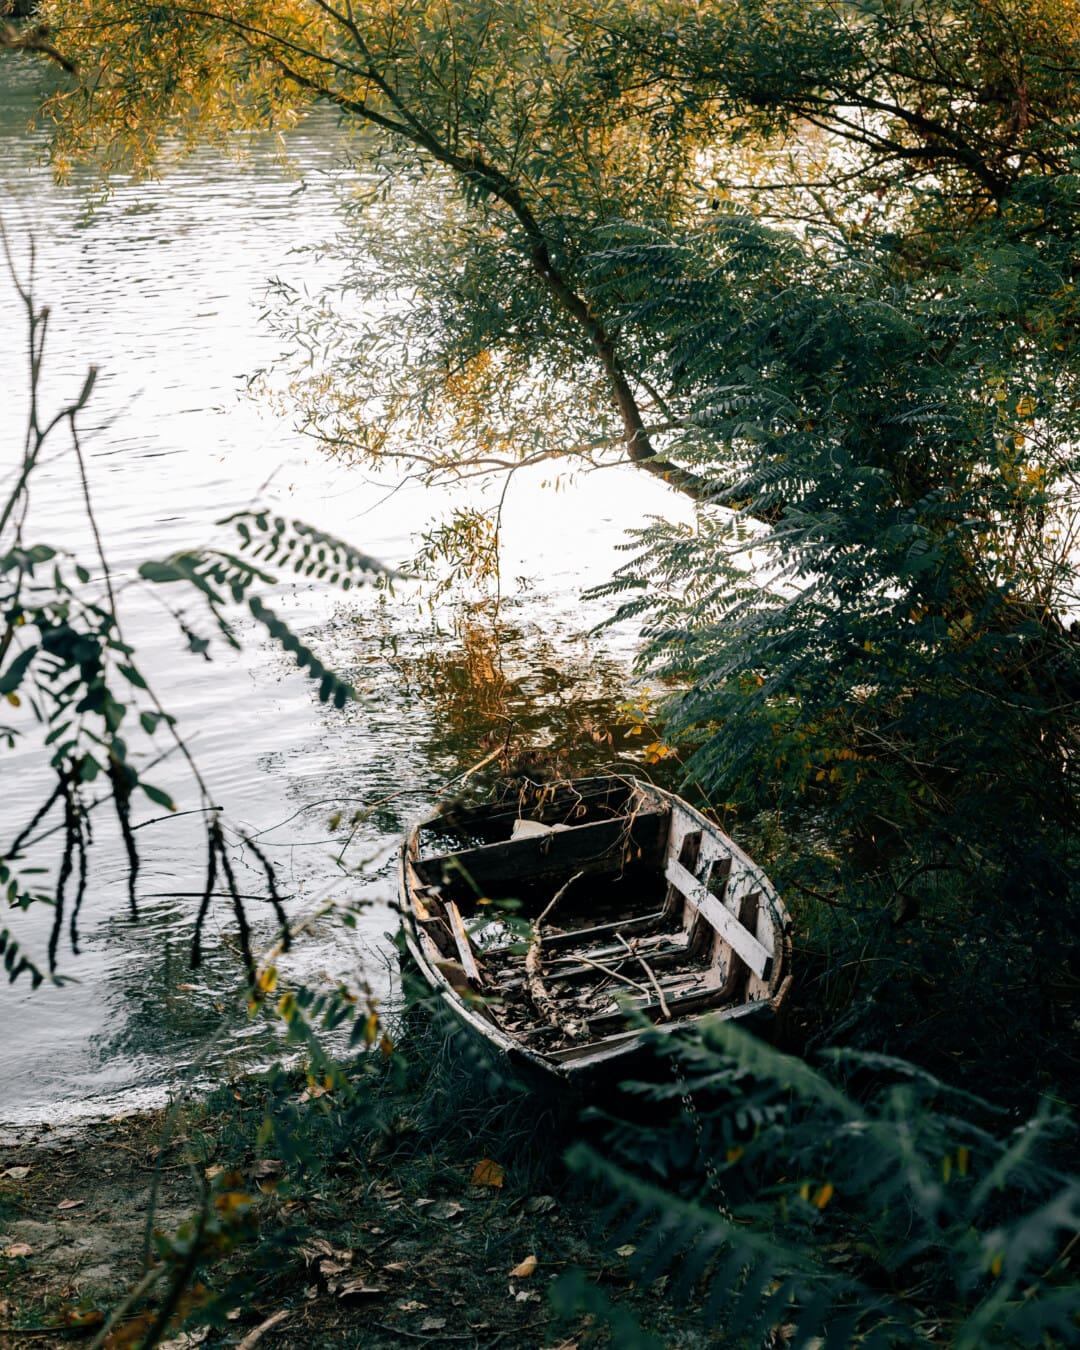 abandonado, barco, arbustos, orilla del río, paisaje, agua, Río, naturaleza, árbol, madera